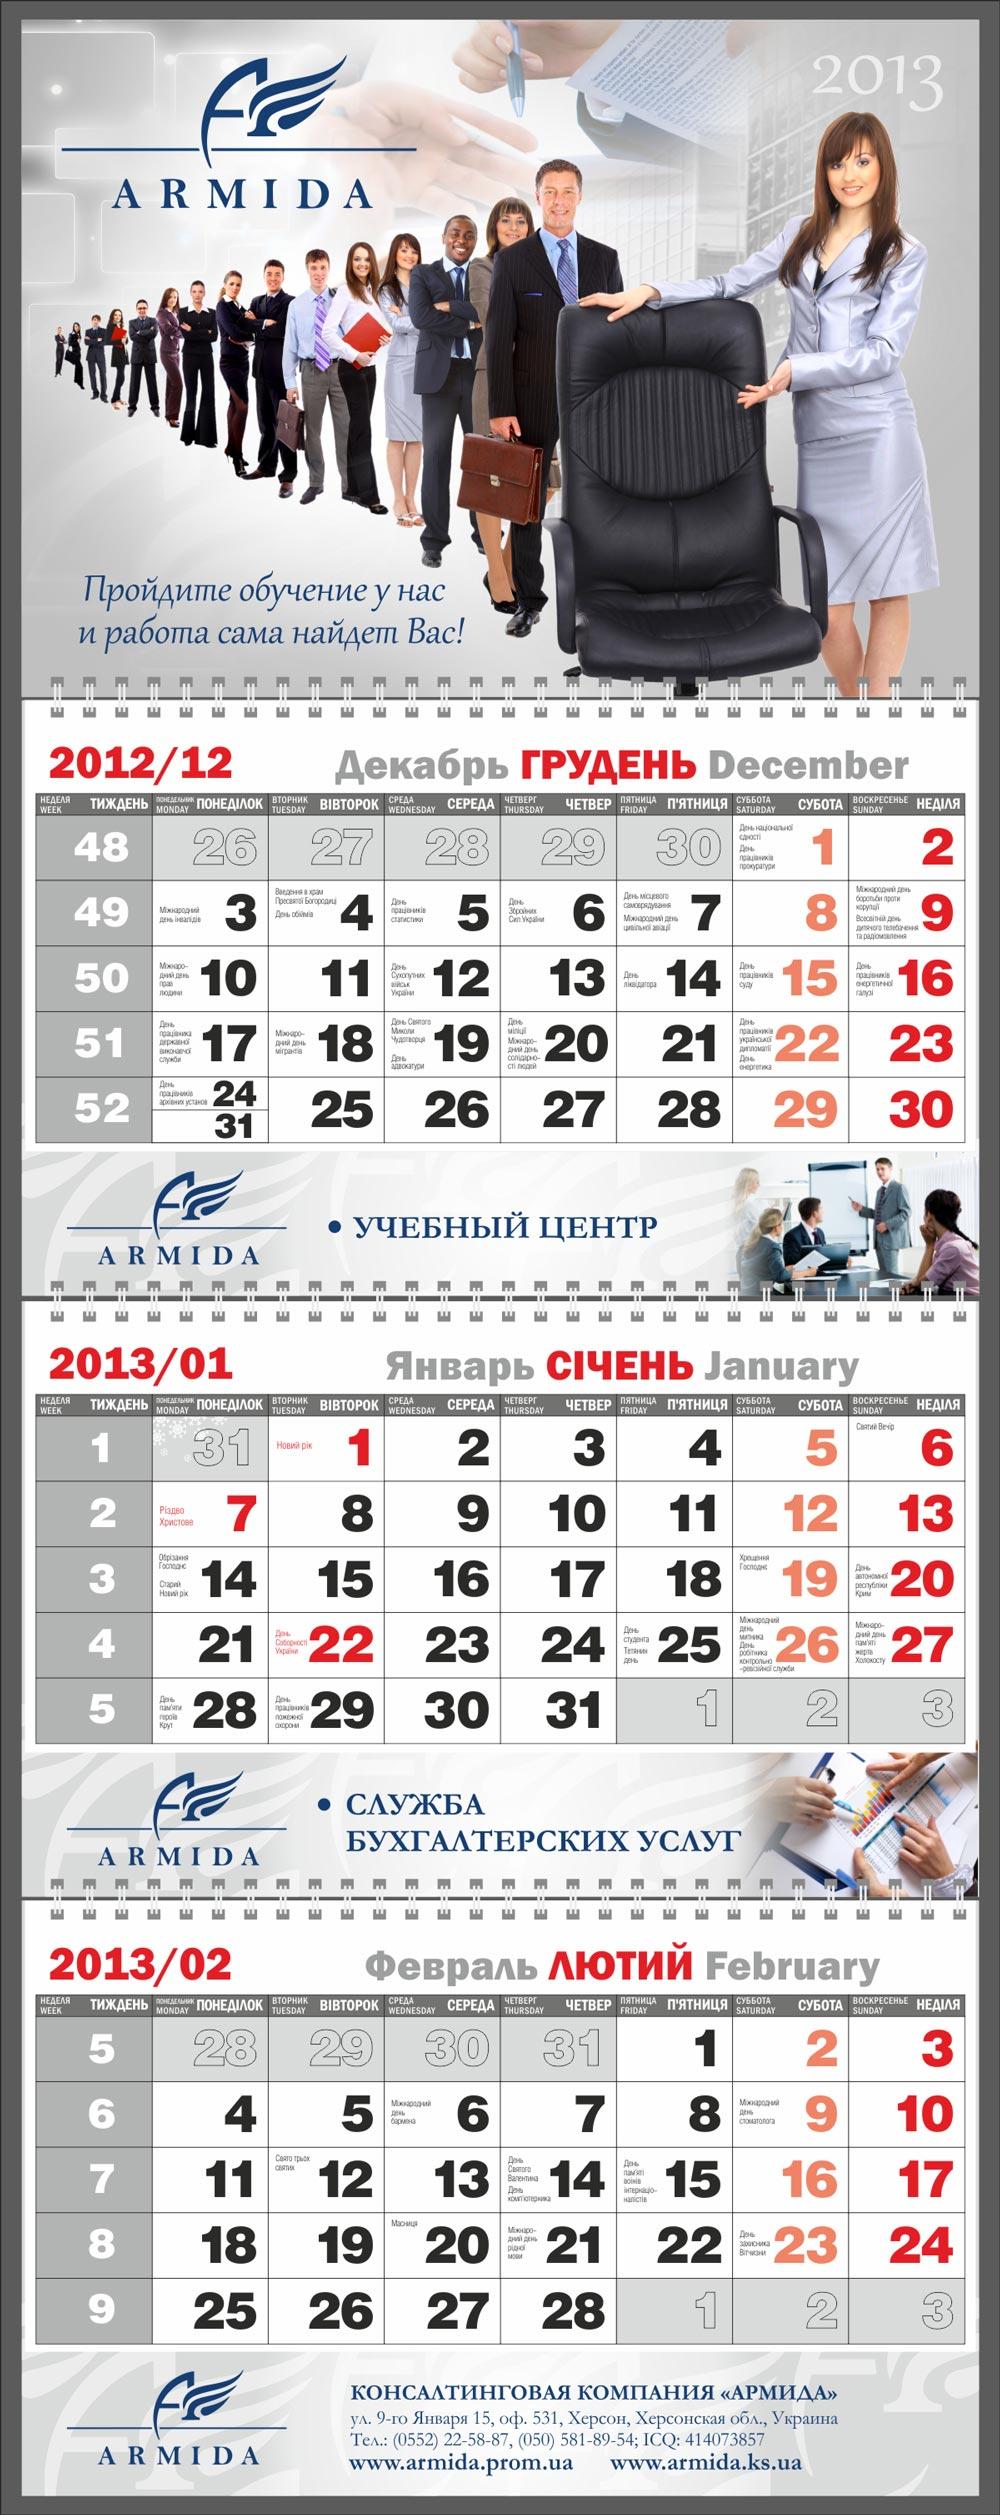 календарь бухгалтерской фирмы Армида в Херсоне